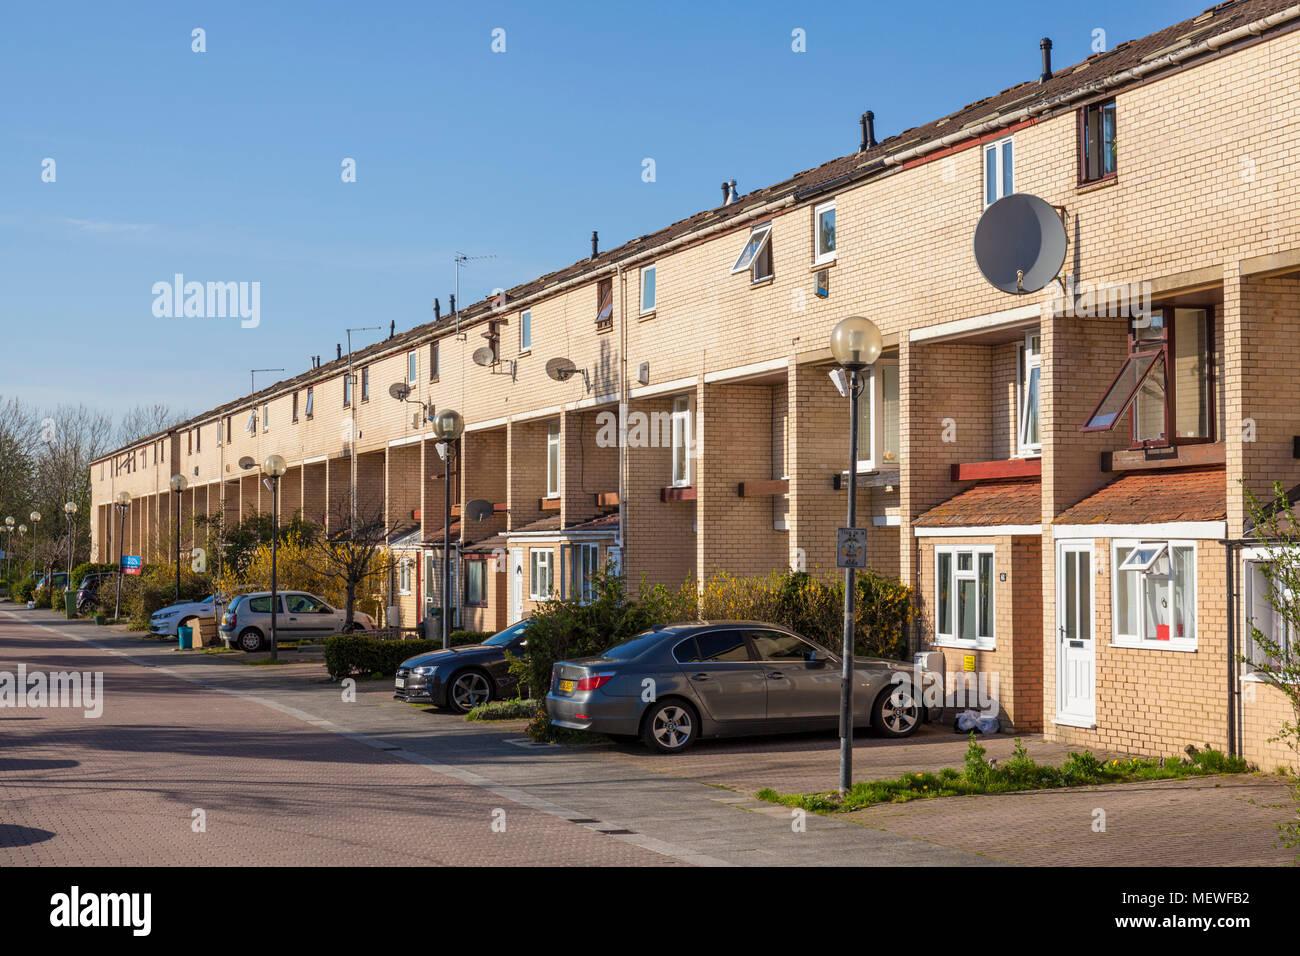 En Milton Keynes, Inglaterra casas de milton keynes central milton keynes buckinghamshire Inglaterra gb uk europa Imagen De Stock